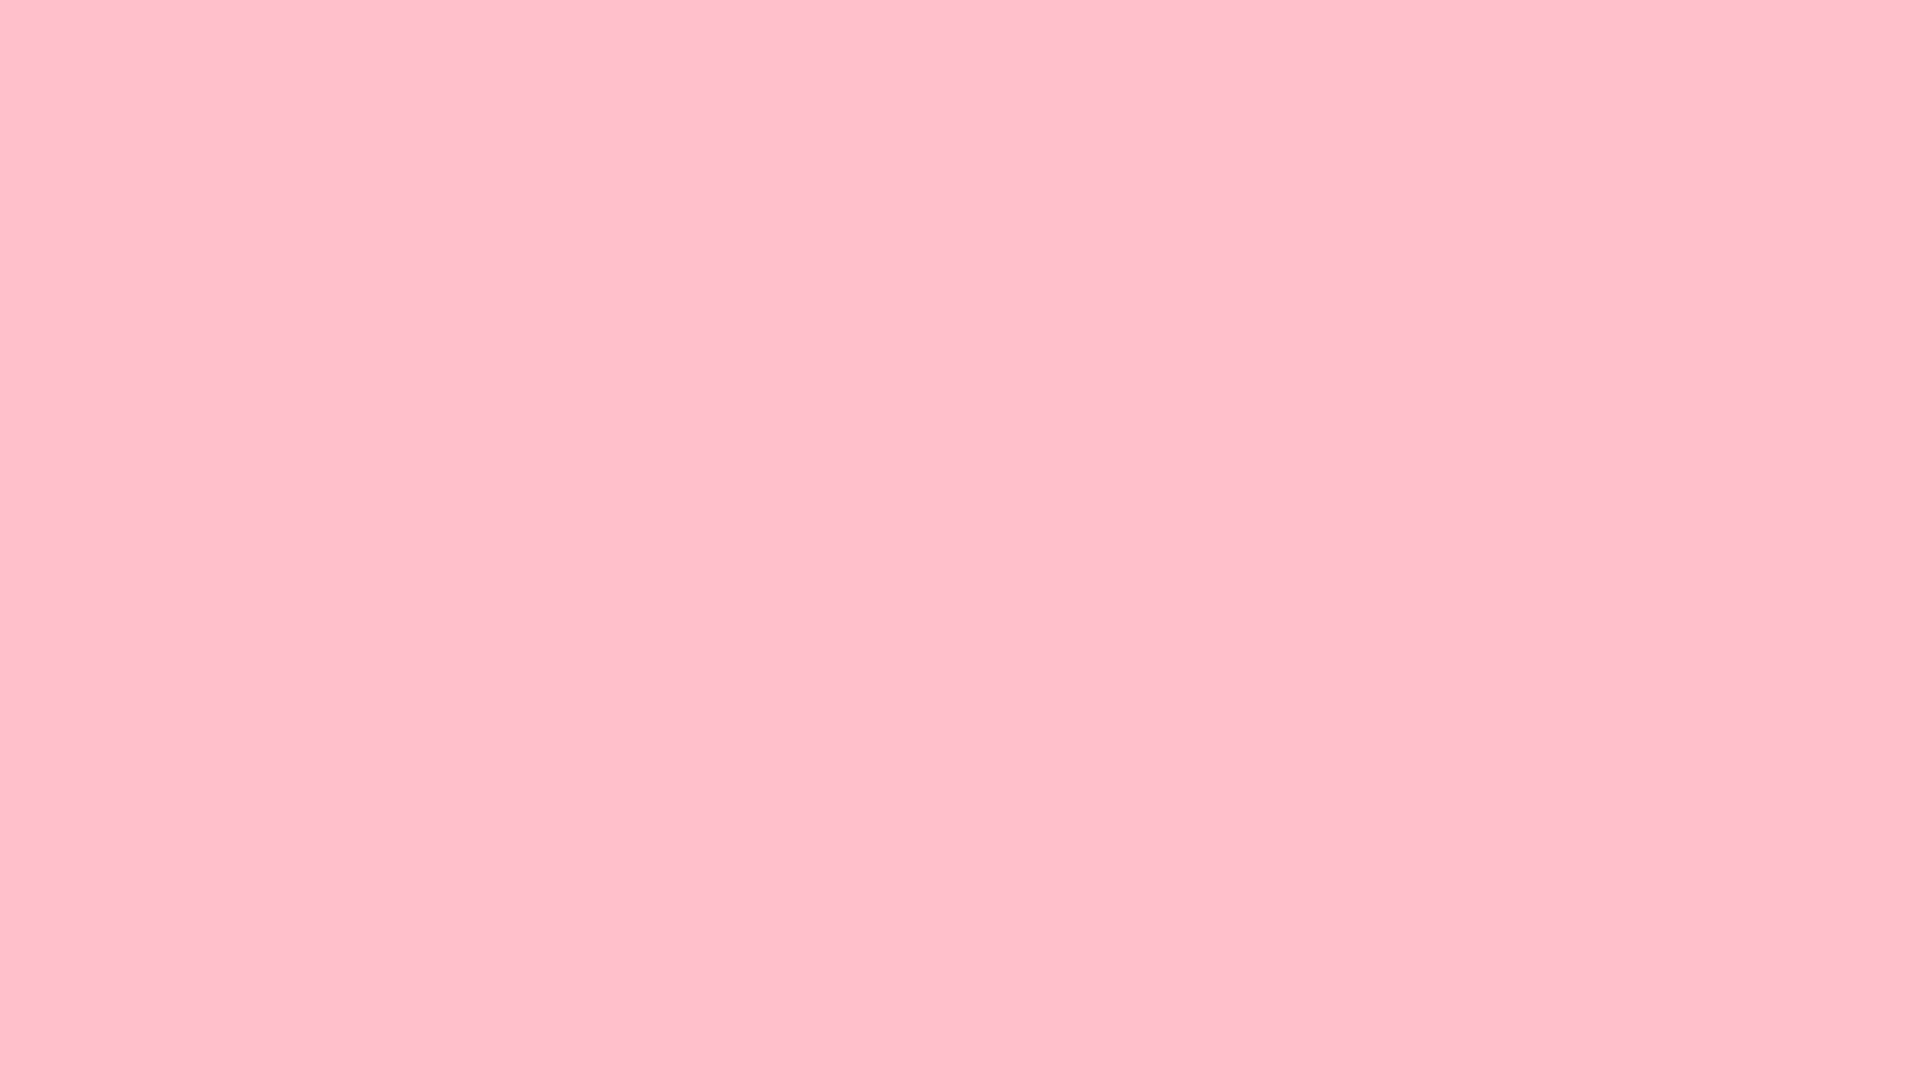 Pastel Pink Wallpaper Full HD